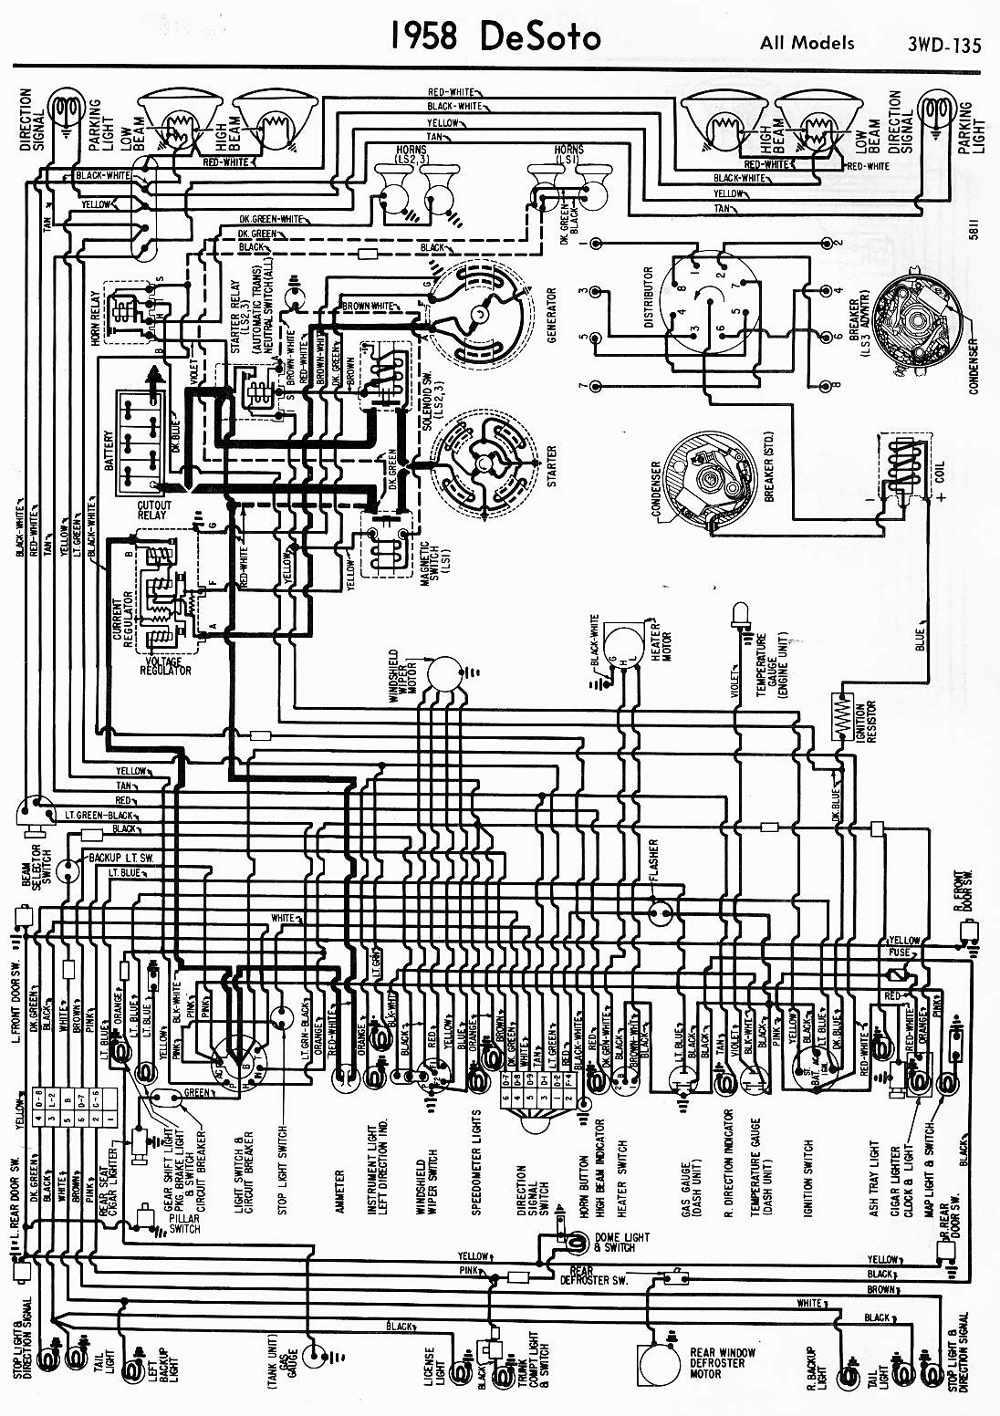 1960 desoto wiring diagram enthusiast wiring diagrams u2022 rh rasalibre co 1960 chrysler 1960 dodge [ 1000 x 1416 Pixel ]